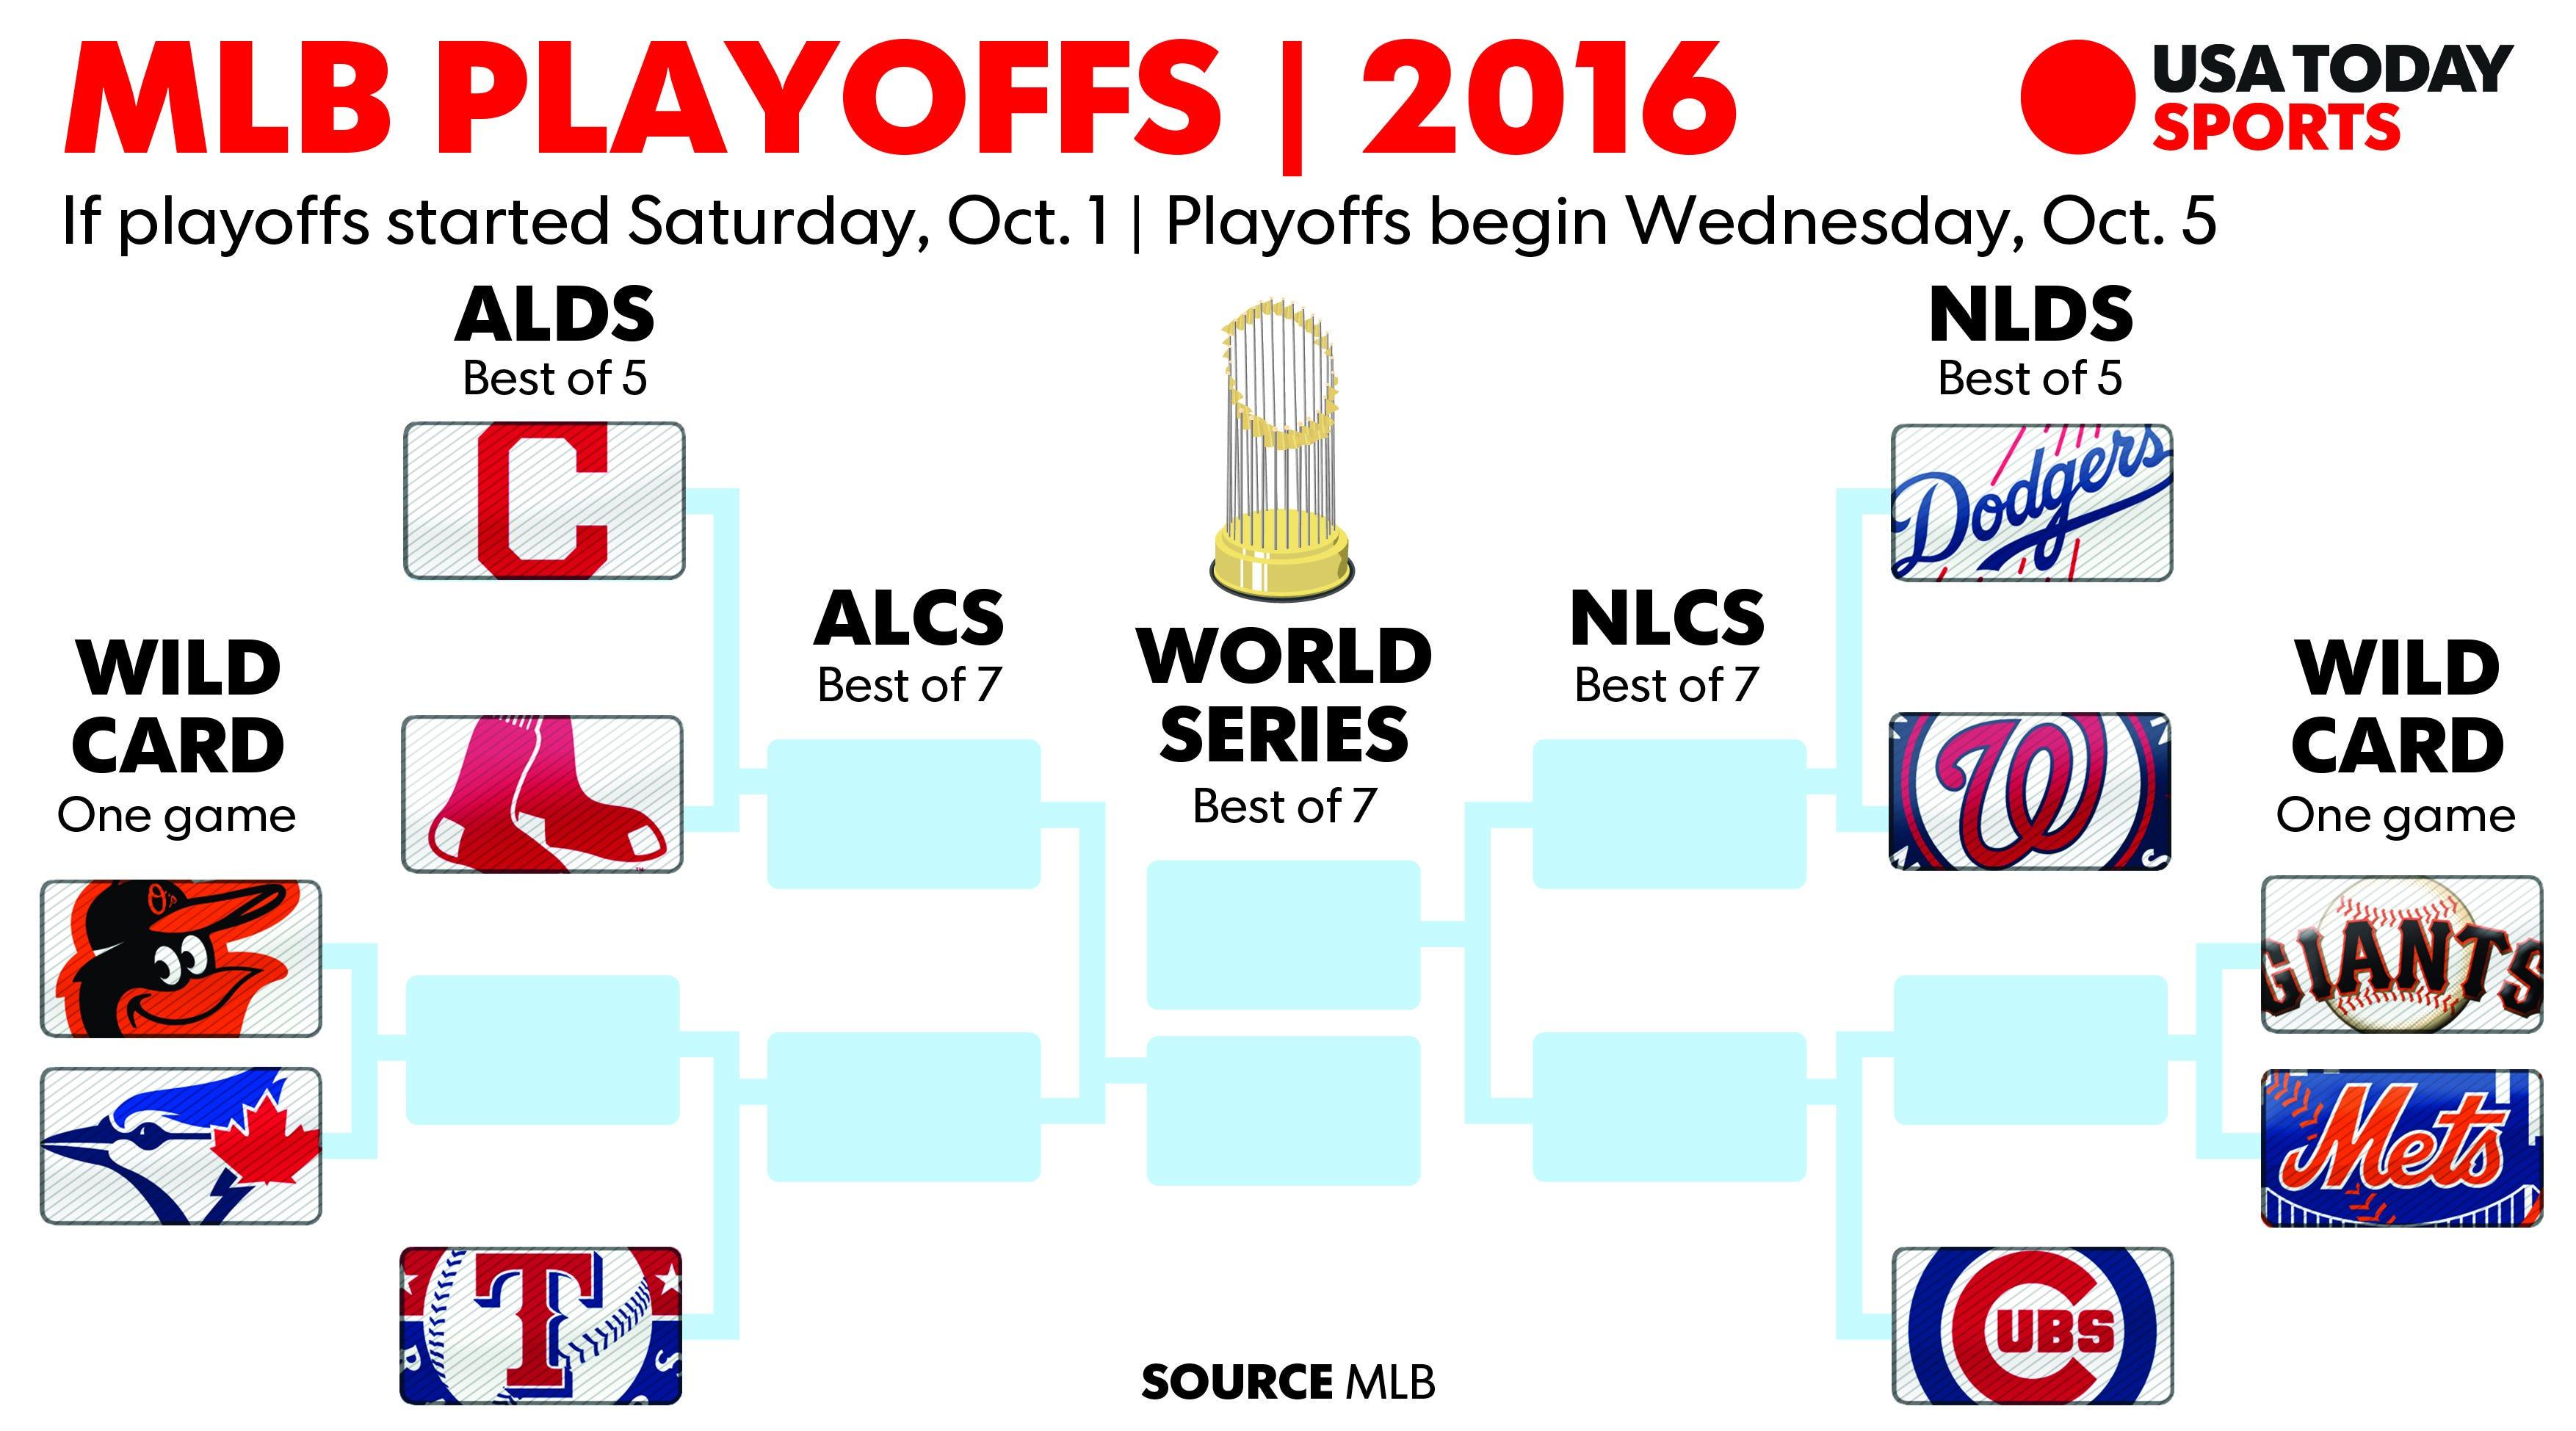 mlb home field advantage 2016 playoffs standing